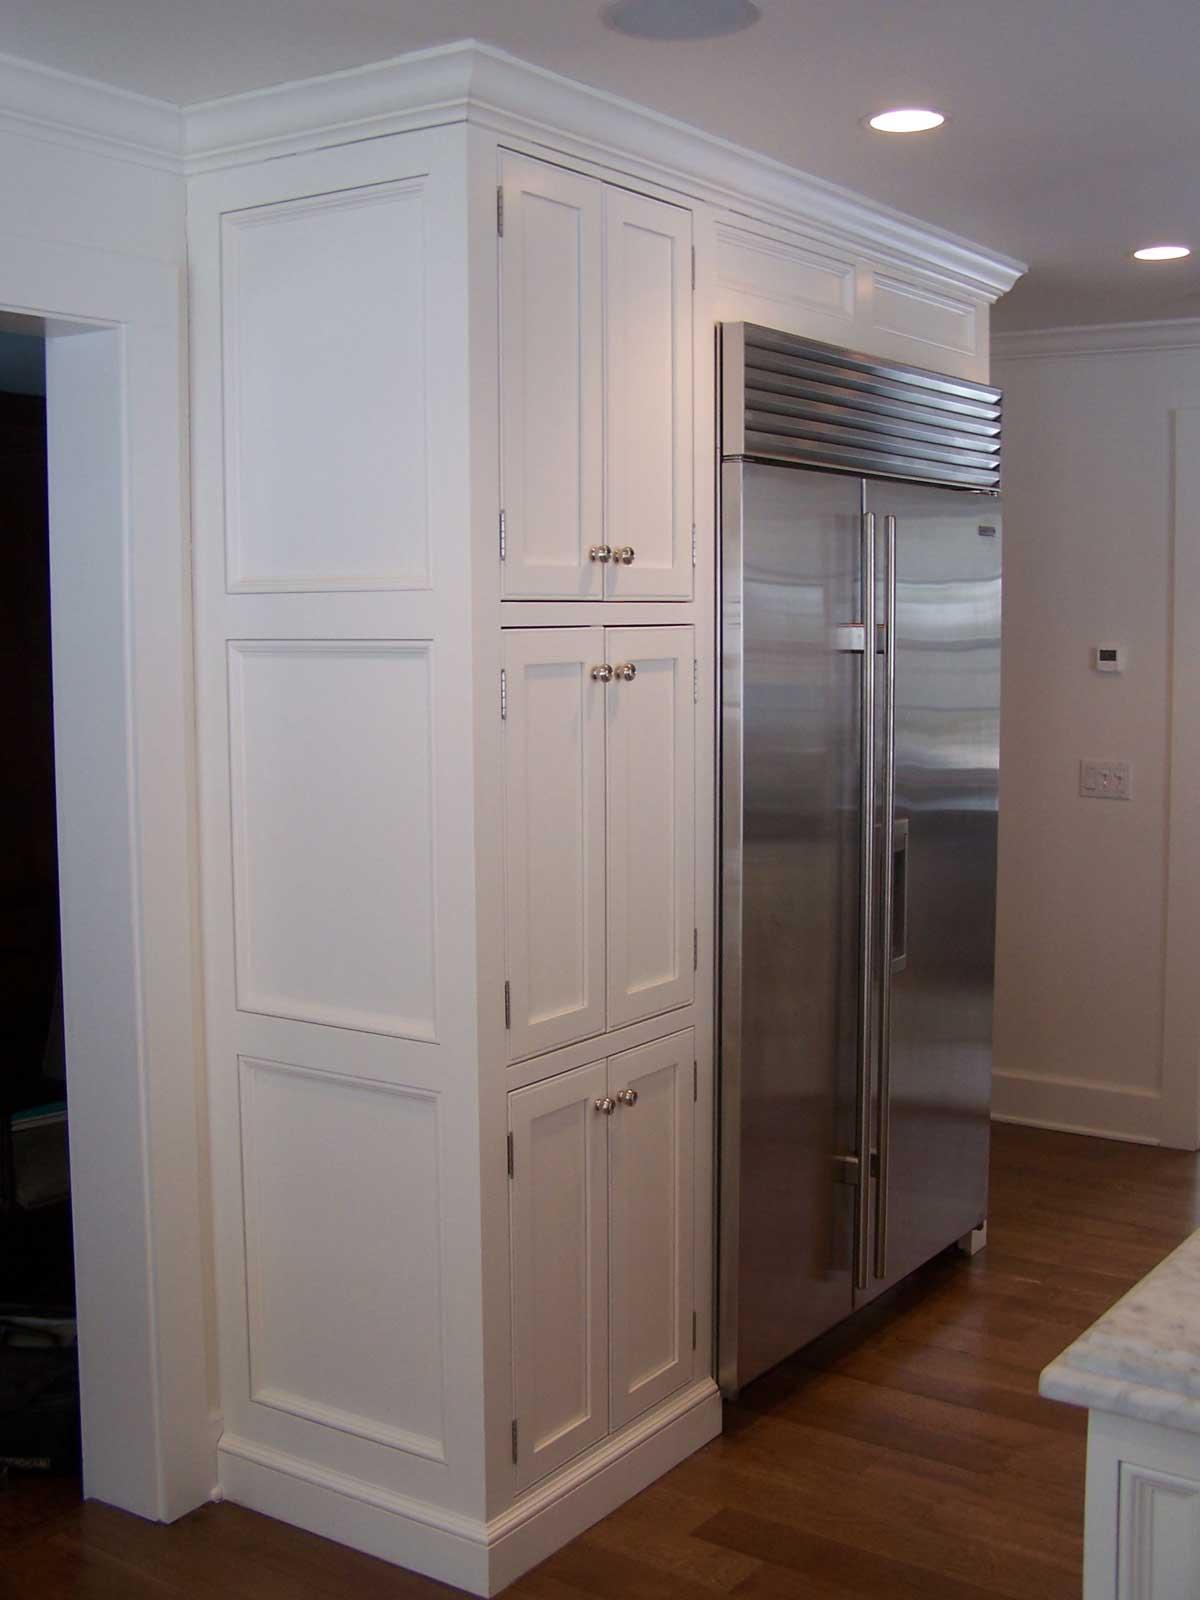 English Manor Kitchen - Hudson Cabinet Making .:. 845.225.2967